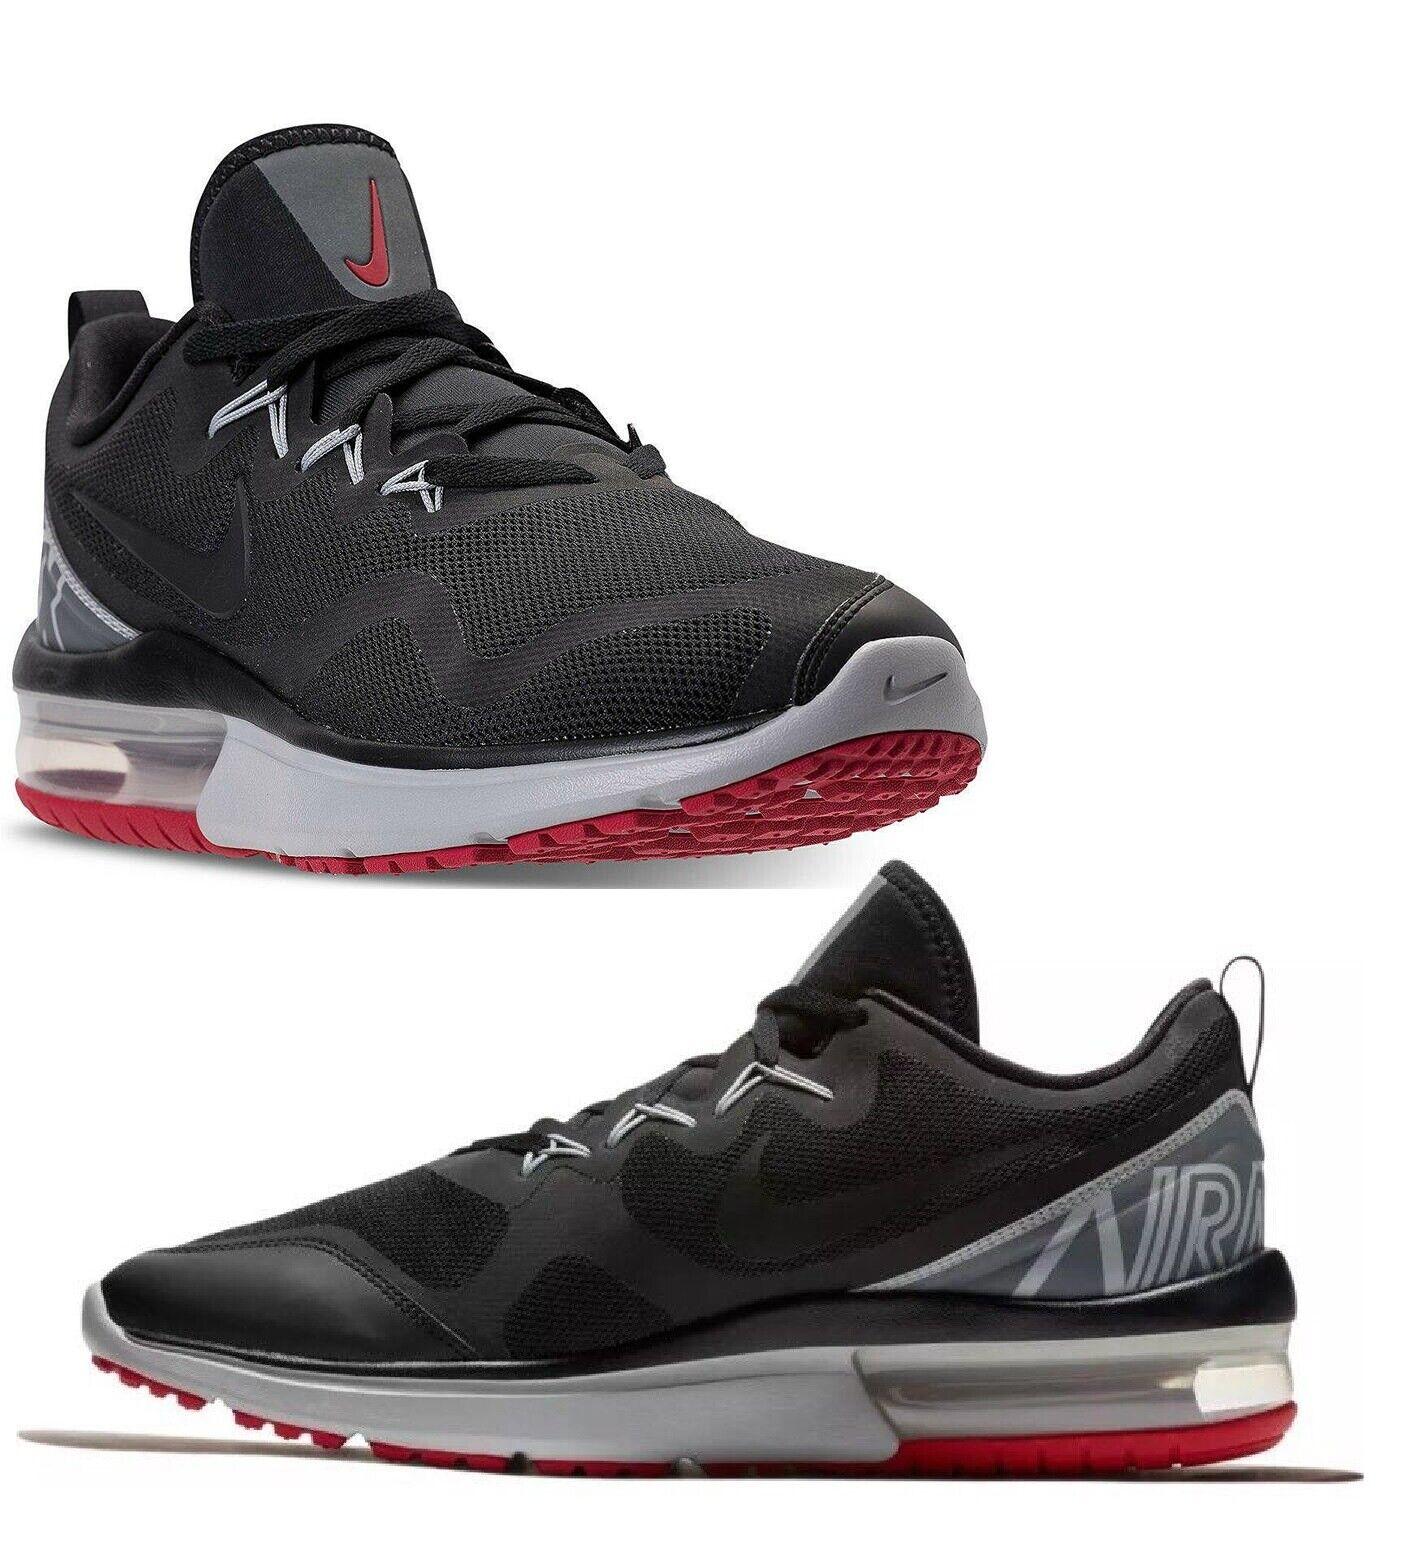 NIke Air Max Fury Mens Trainer shoe Sze 8 Black Red Grey